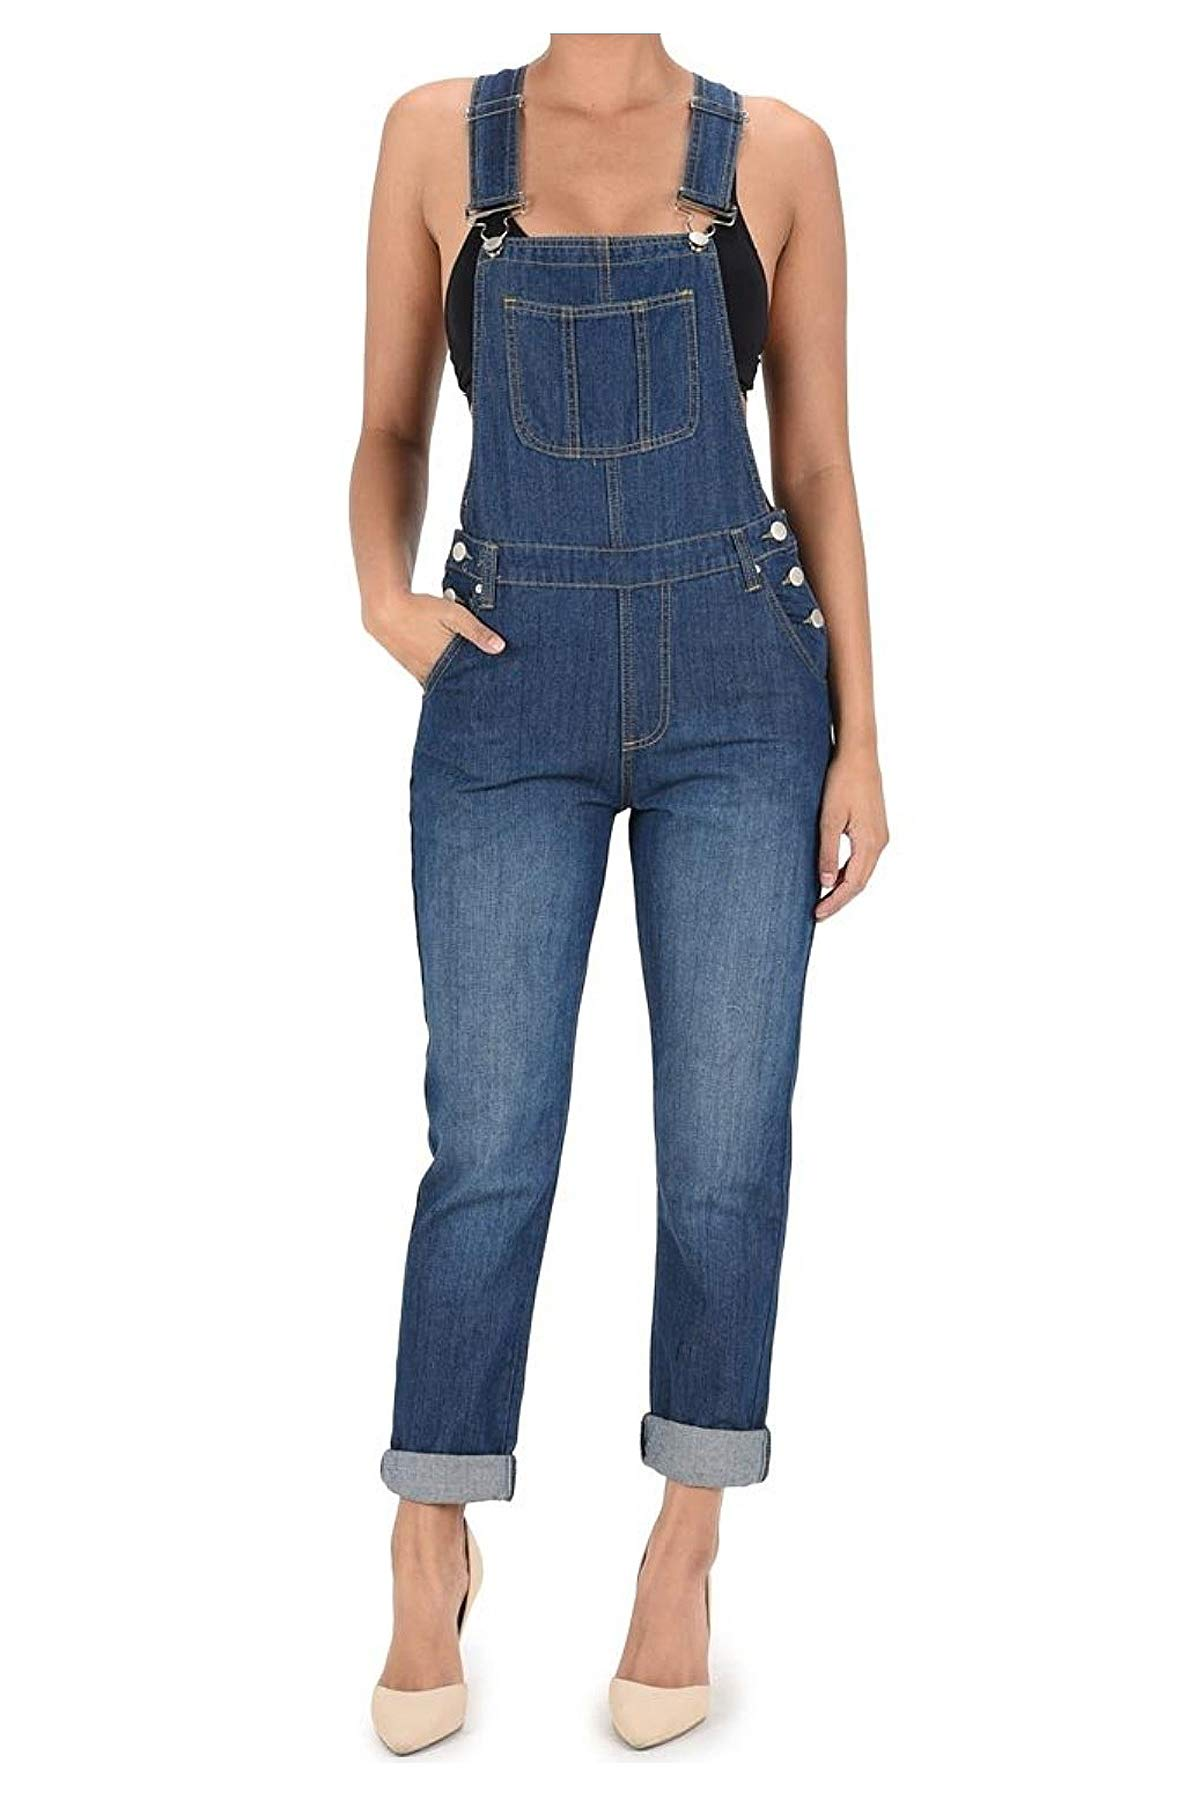 TwiinSisters Women's Basic Boyfriend Fit Denim Bib Overalls Plus (Large, Blue #Rjho170) by TwiinSisters